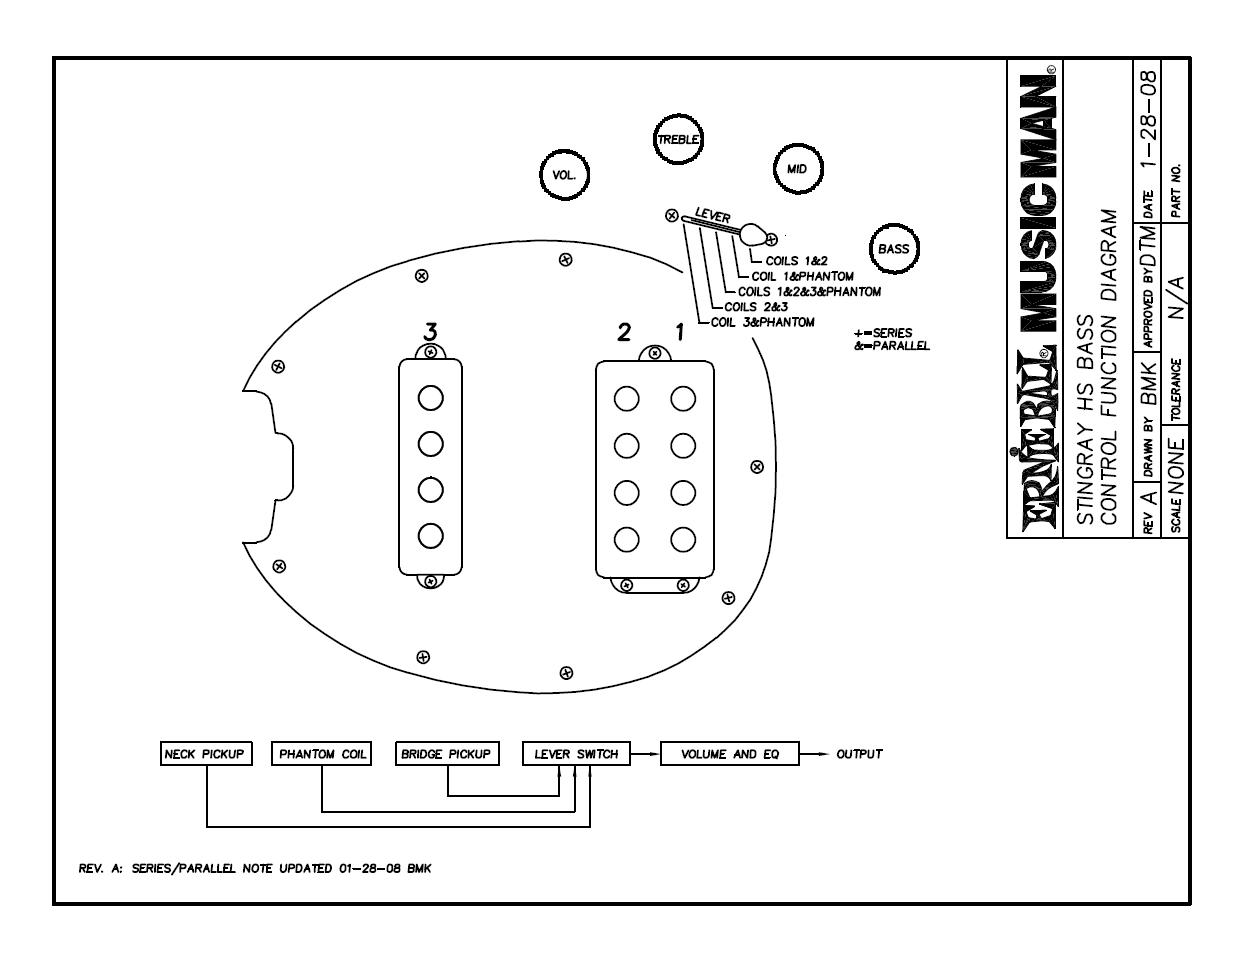 hight resolution of 3 wire diagram man wiring diagram uk data triumph wiring diagrams music man sterling hh wiring